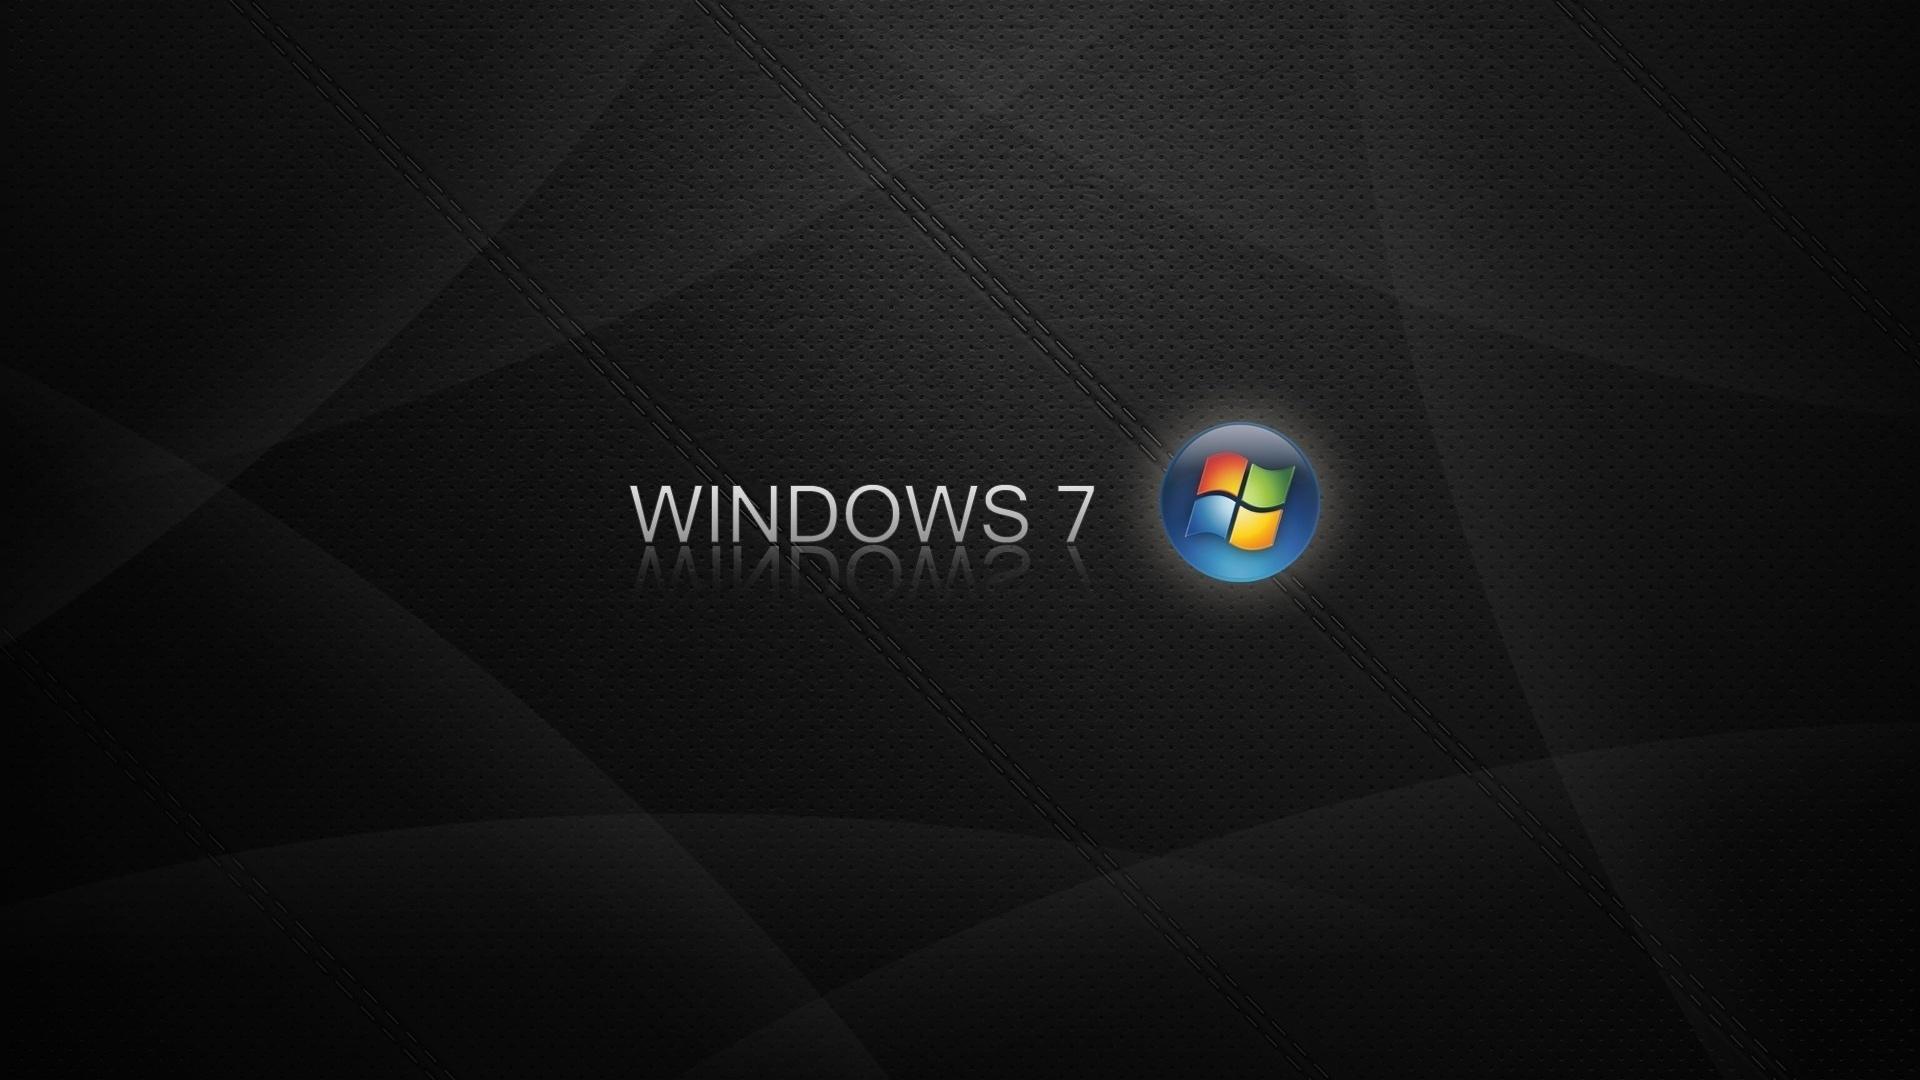 Windows 7 Wallpaper 1920x1080 Who Is Dayani Cristal Wikipedia